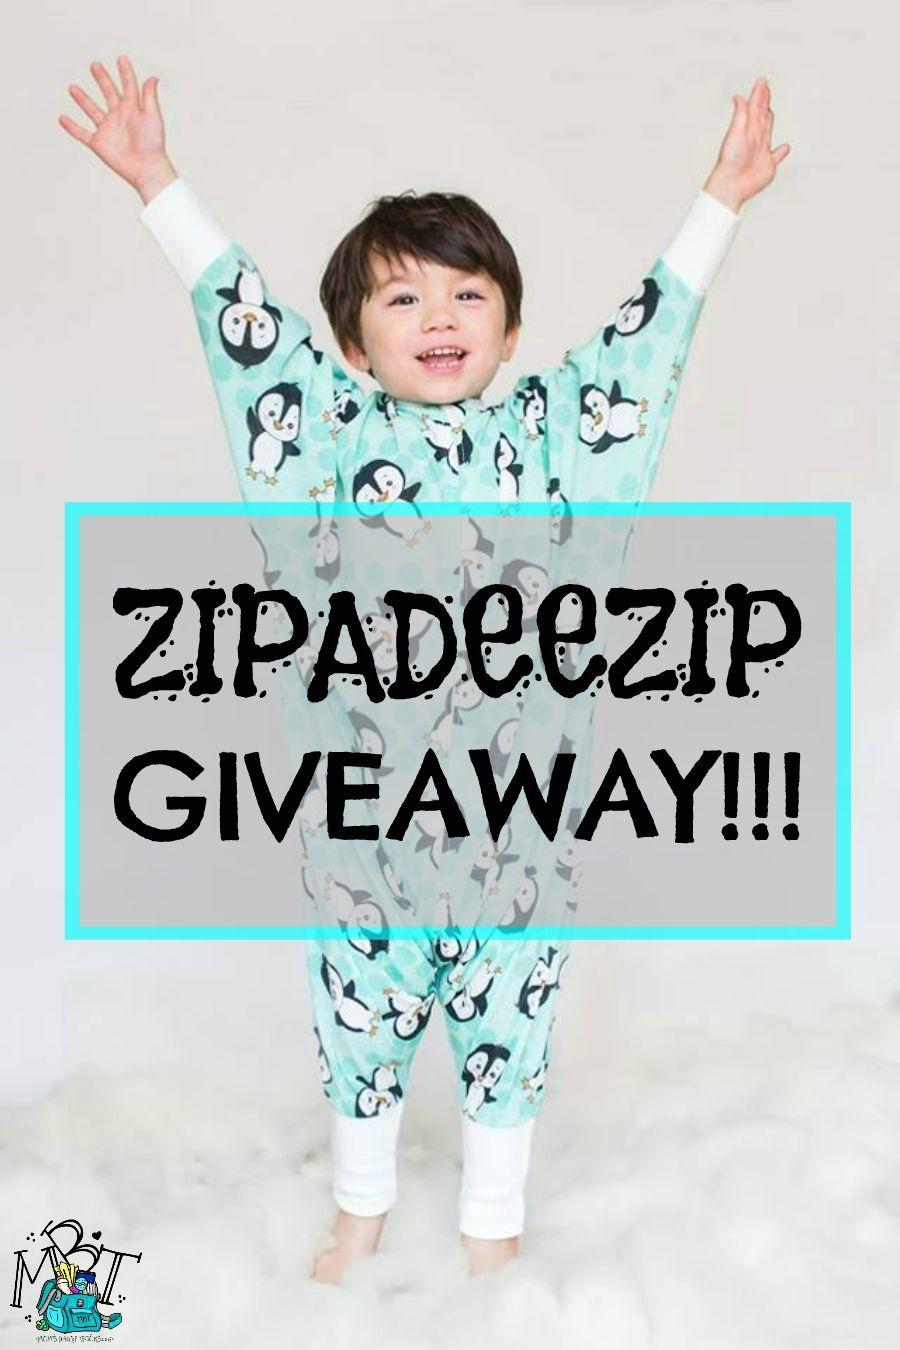 A chance to win a FREE ZIPADEEZIP!!!!!